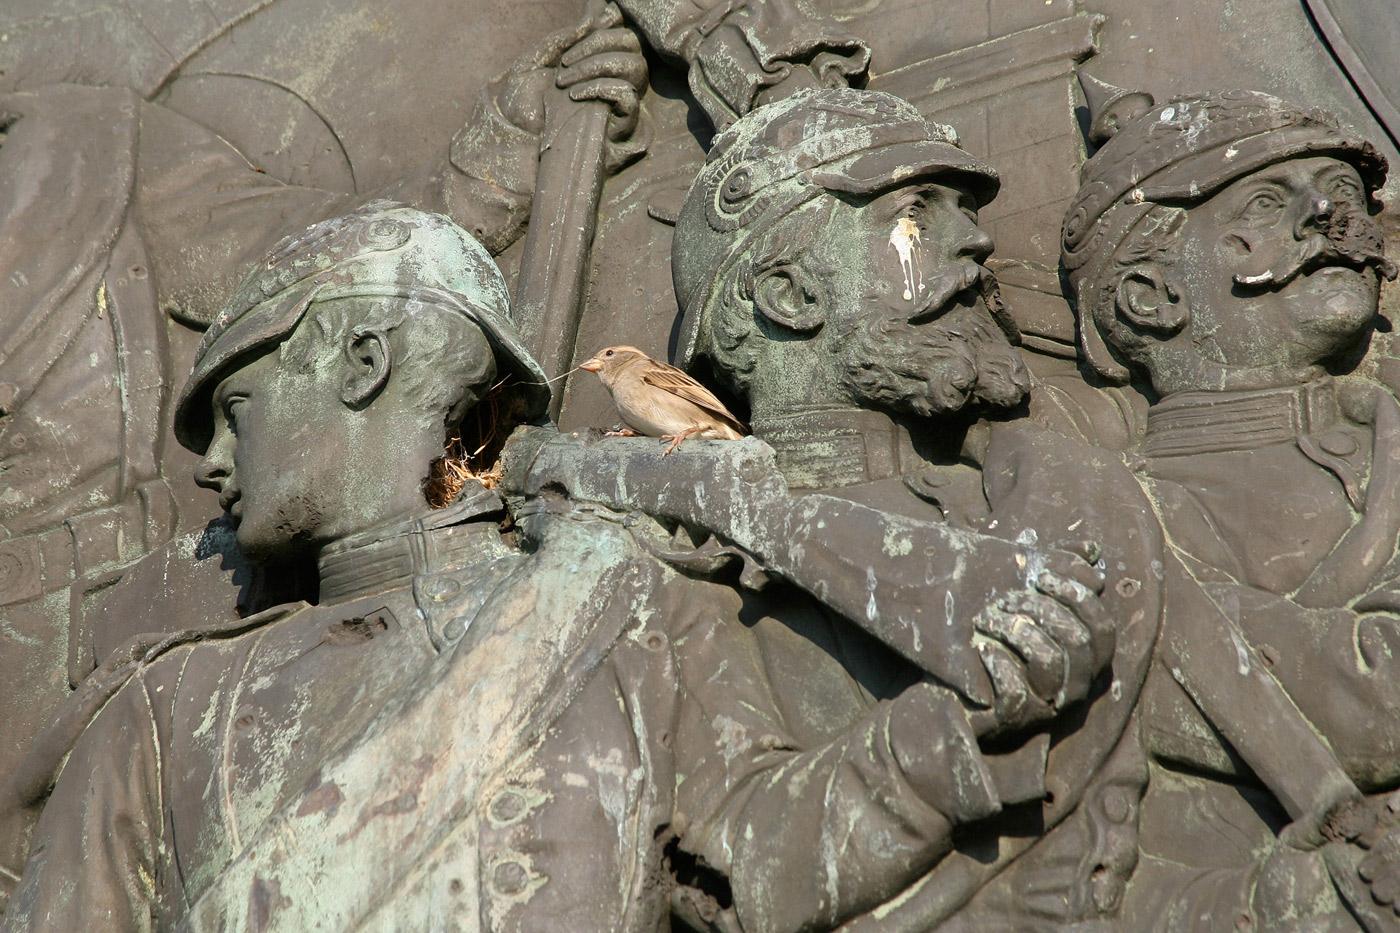 bird-nesting-siegessaule-berlin